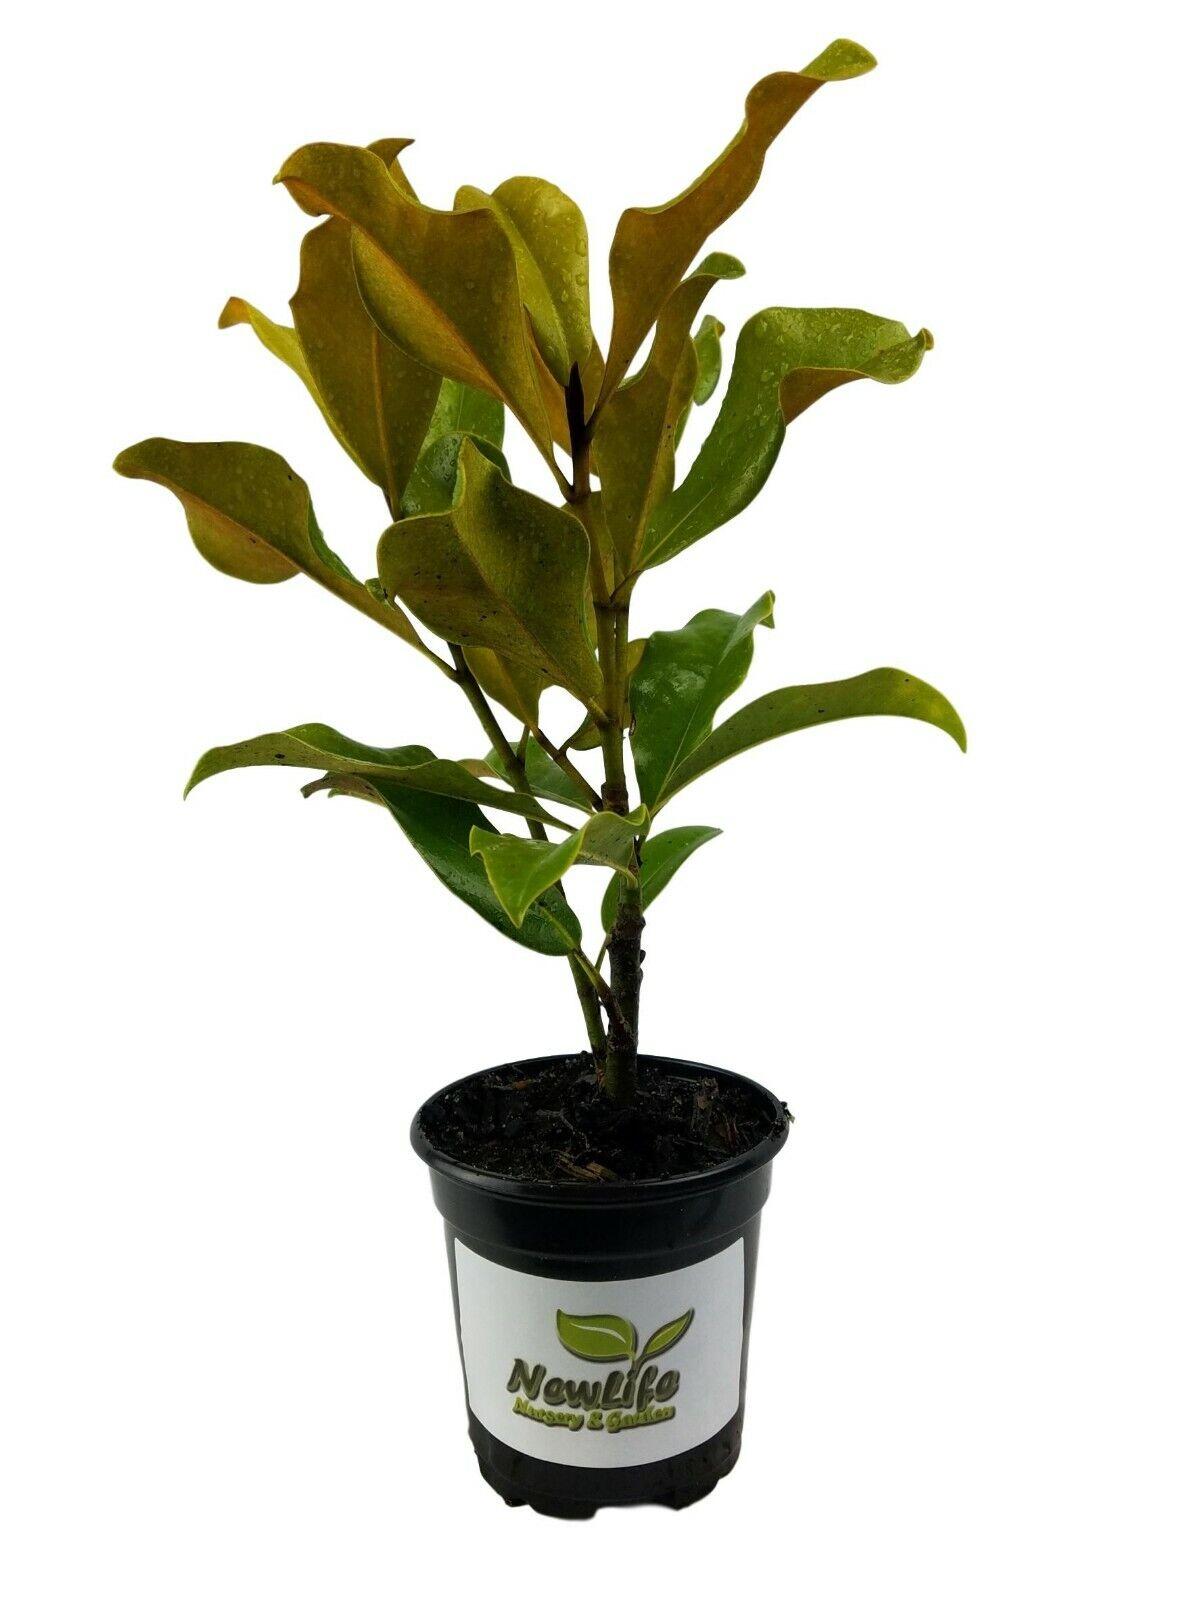 Brackens Brown Beauty Southern Magnolia Tree Live Plant Quart Pot Ebay